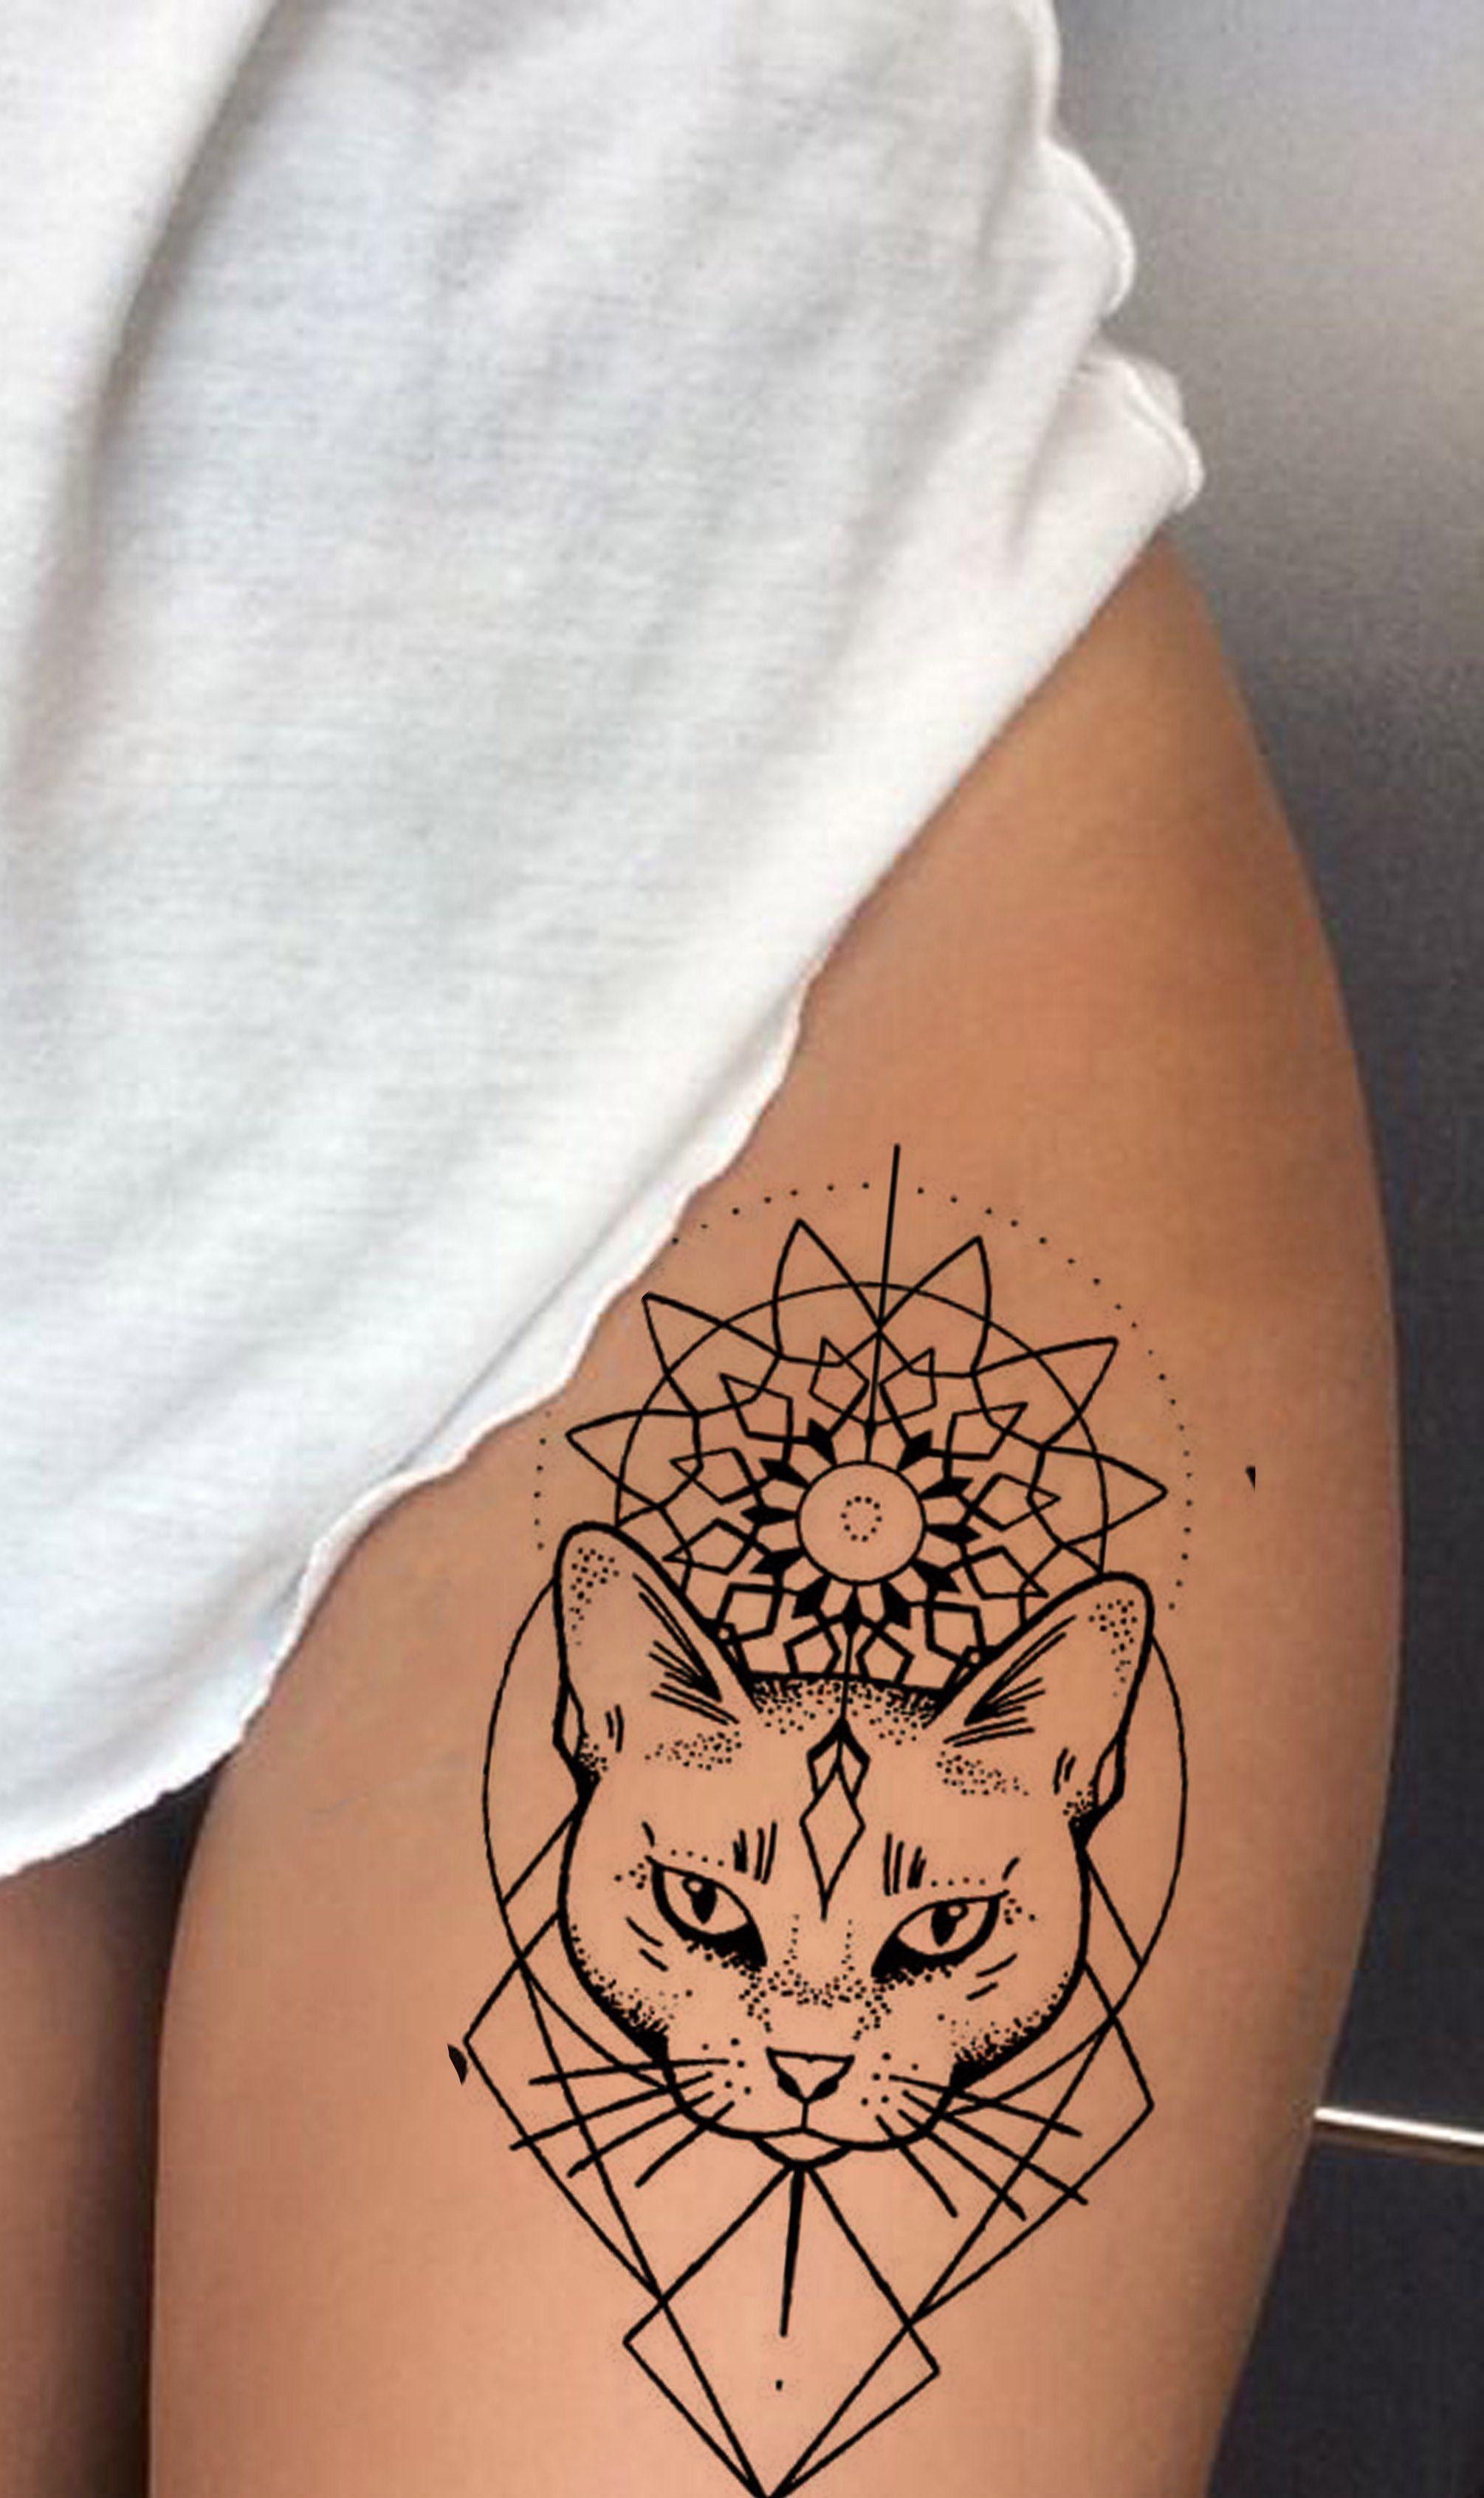 Pin By Florencia Varela Pozzi On Tattoos Pattern Tattoo Tattoos